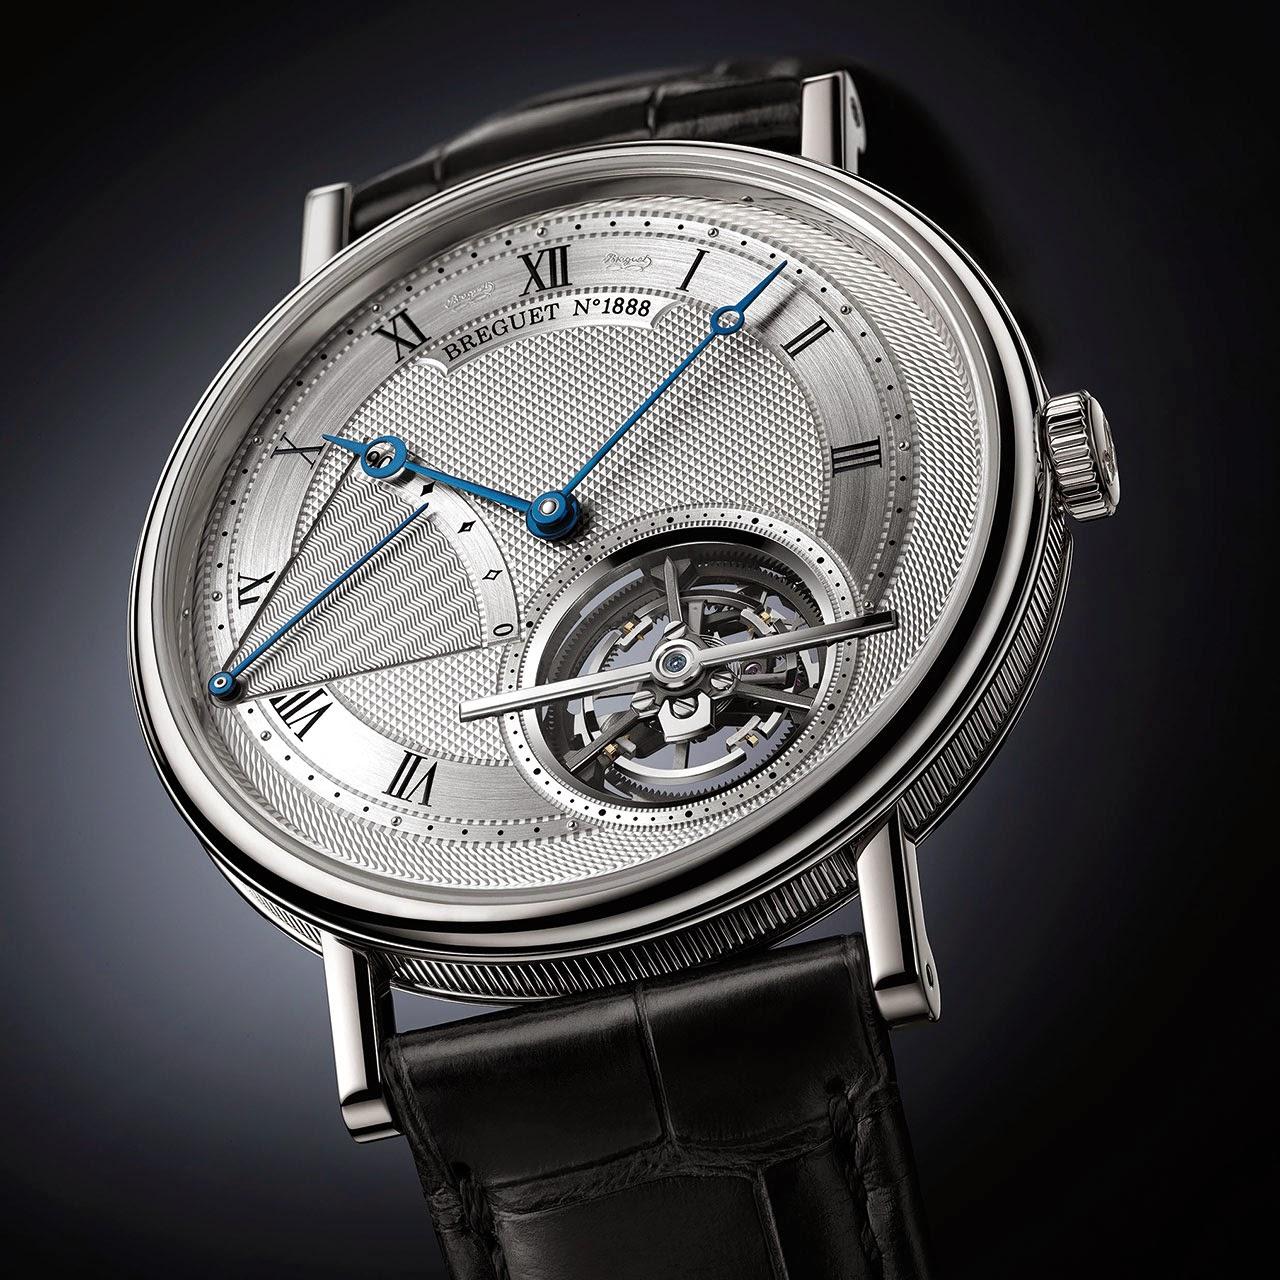 Breguet Classique Grande Complication Tourbillon Extra-Plat Automatique 5377 Watch